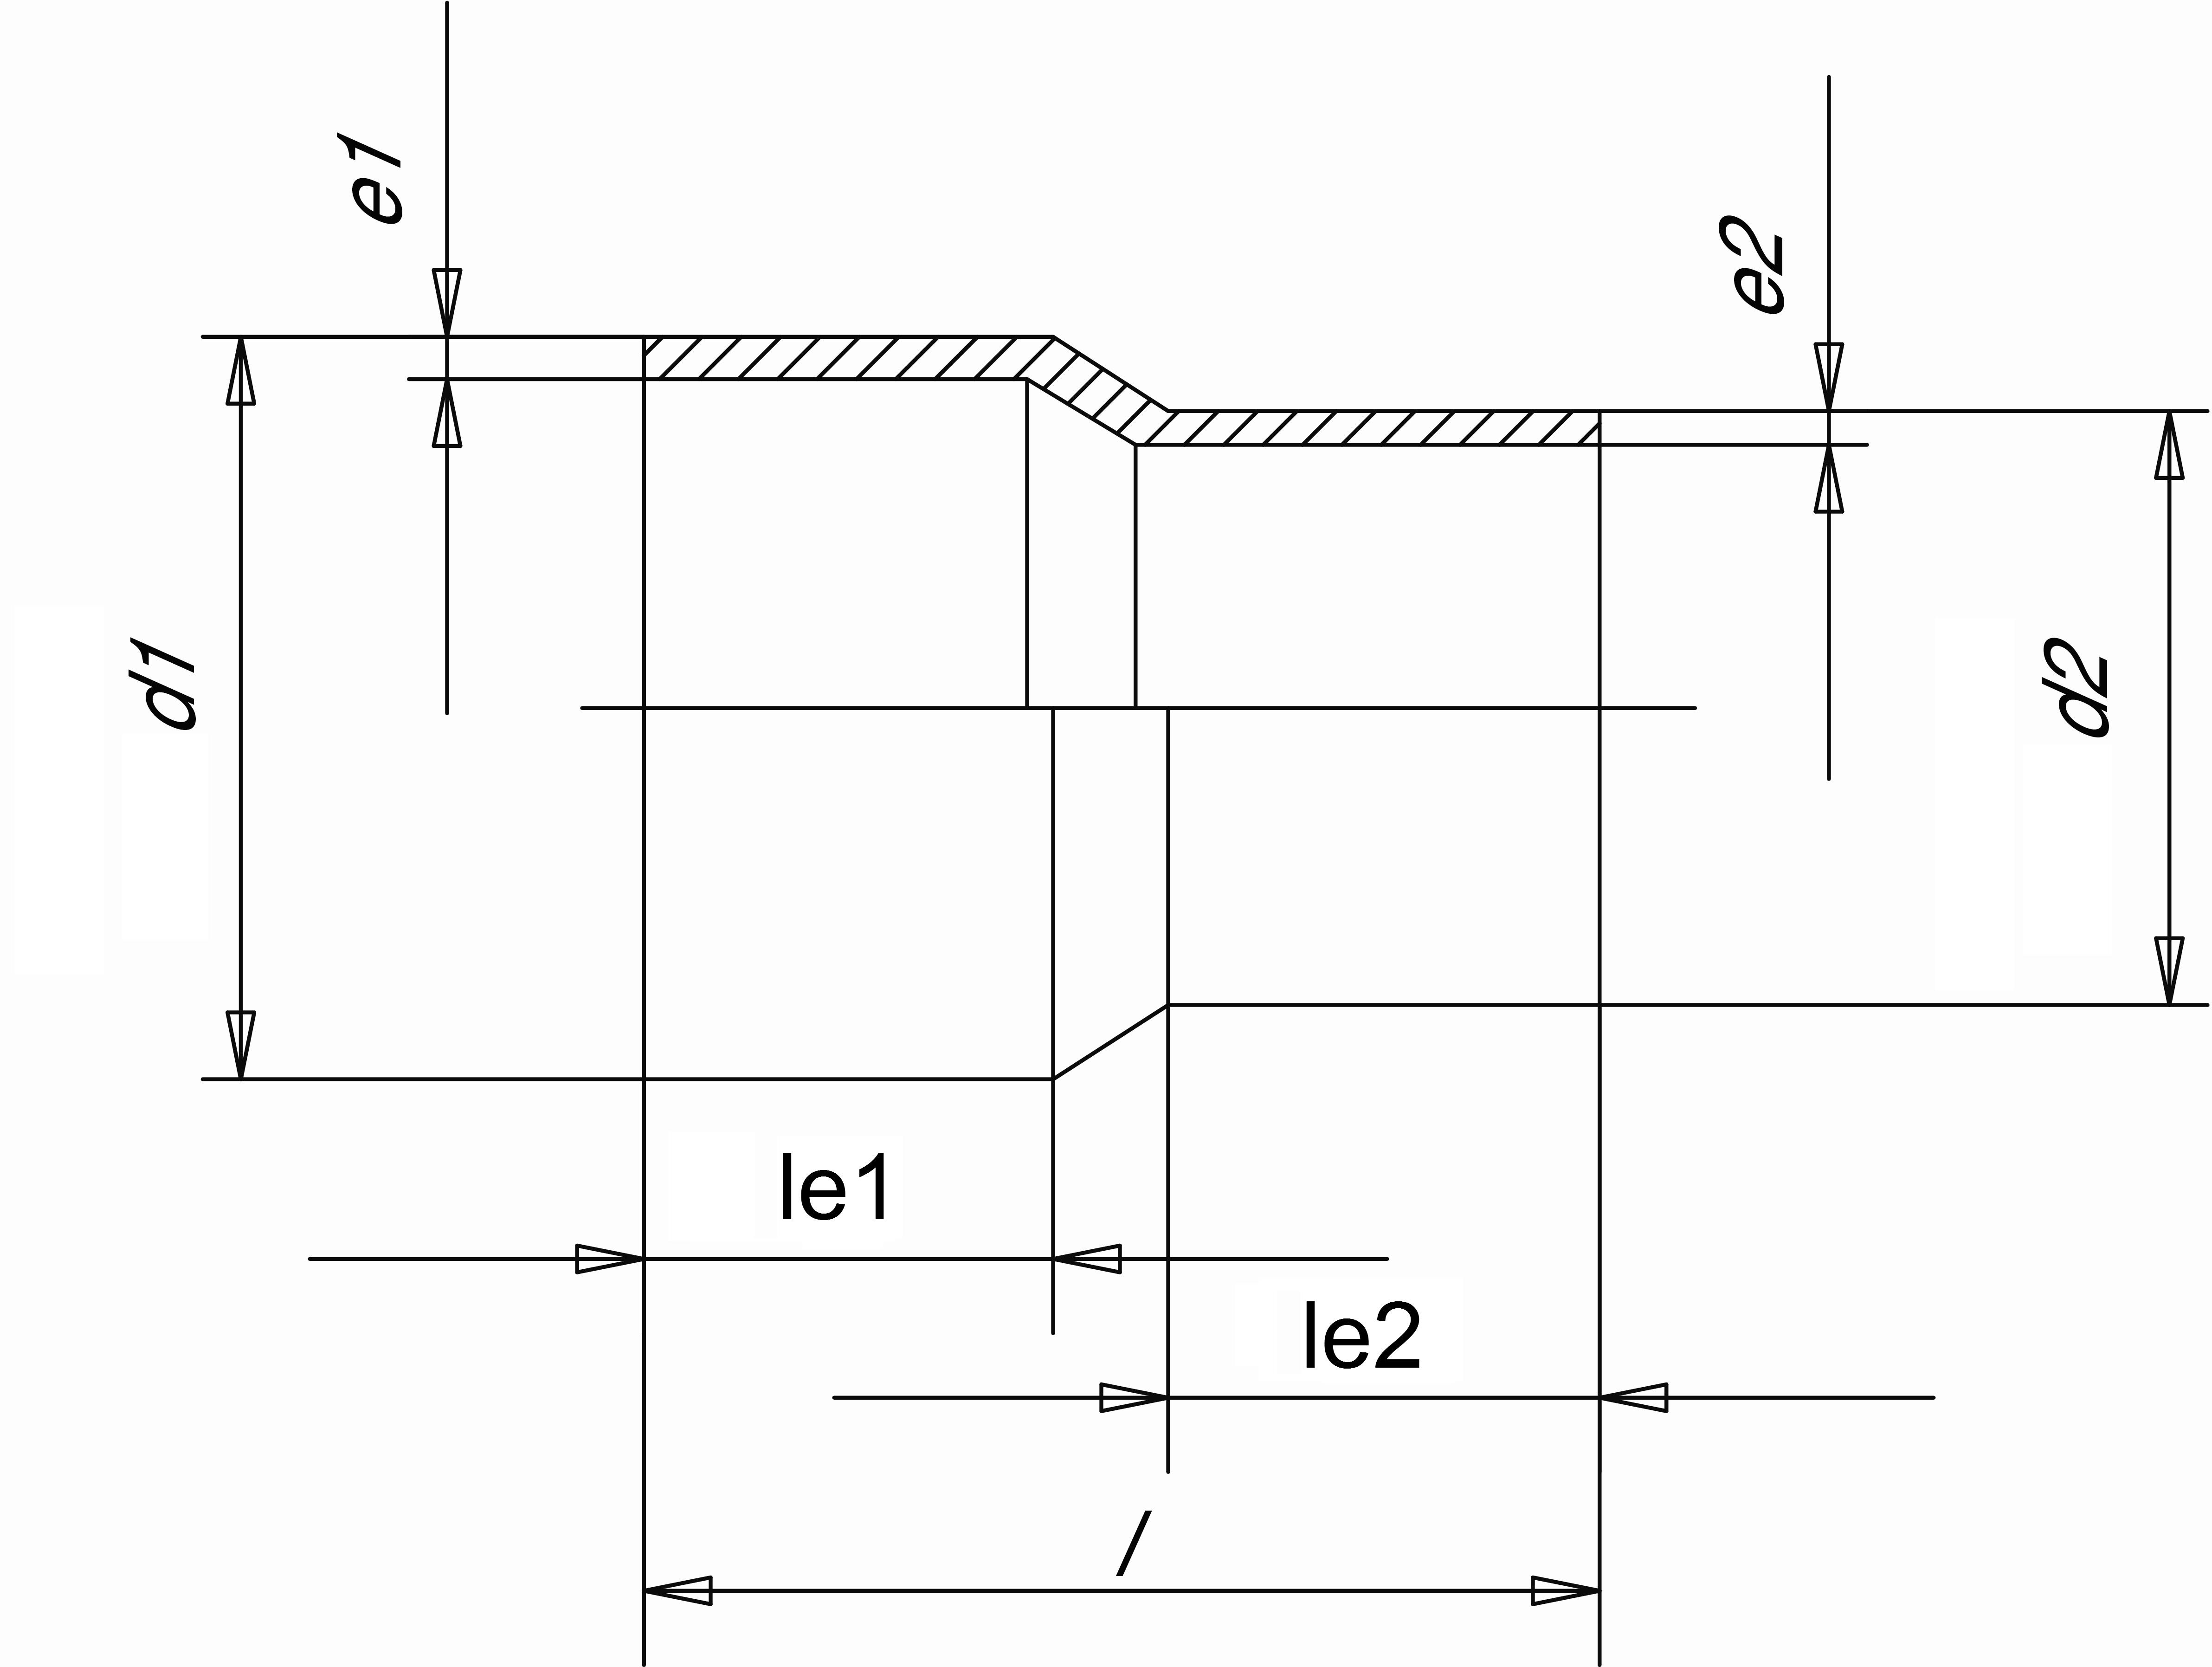 Муфта редукционная (Simona) 75x50 SDR21 PN16